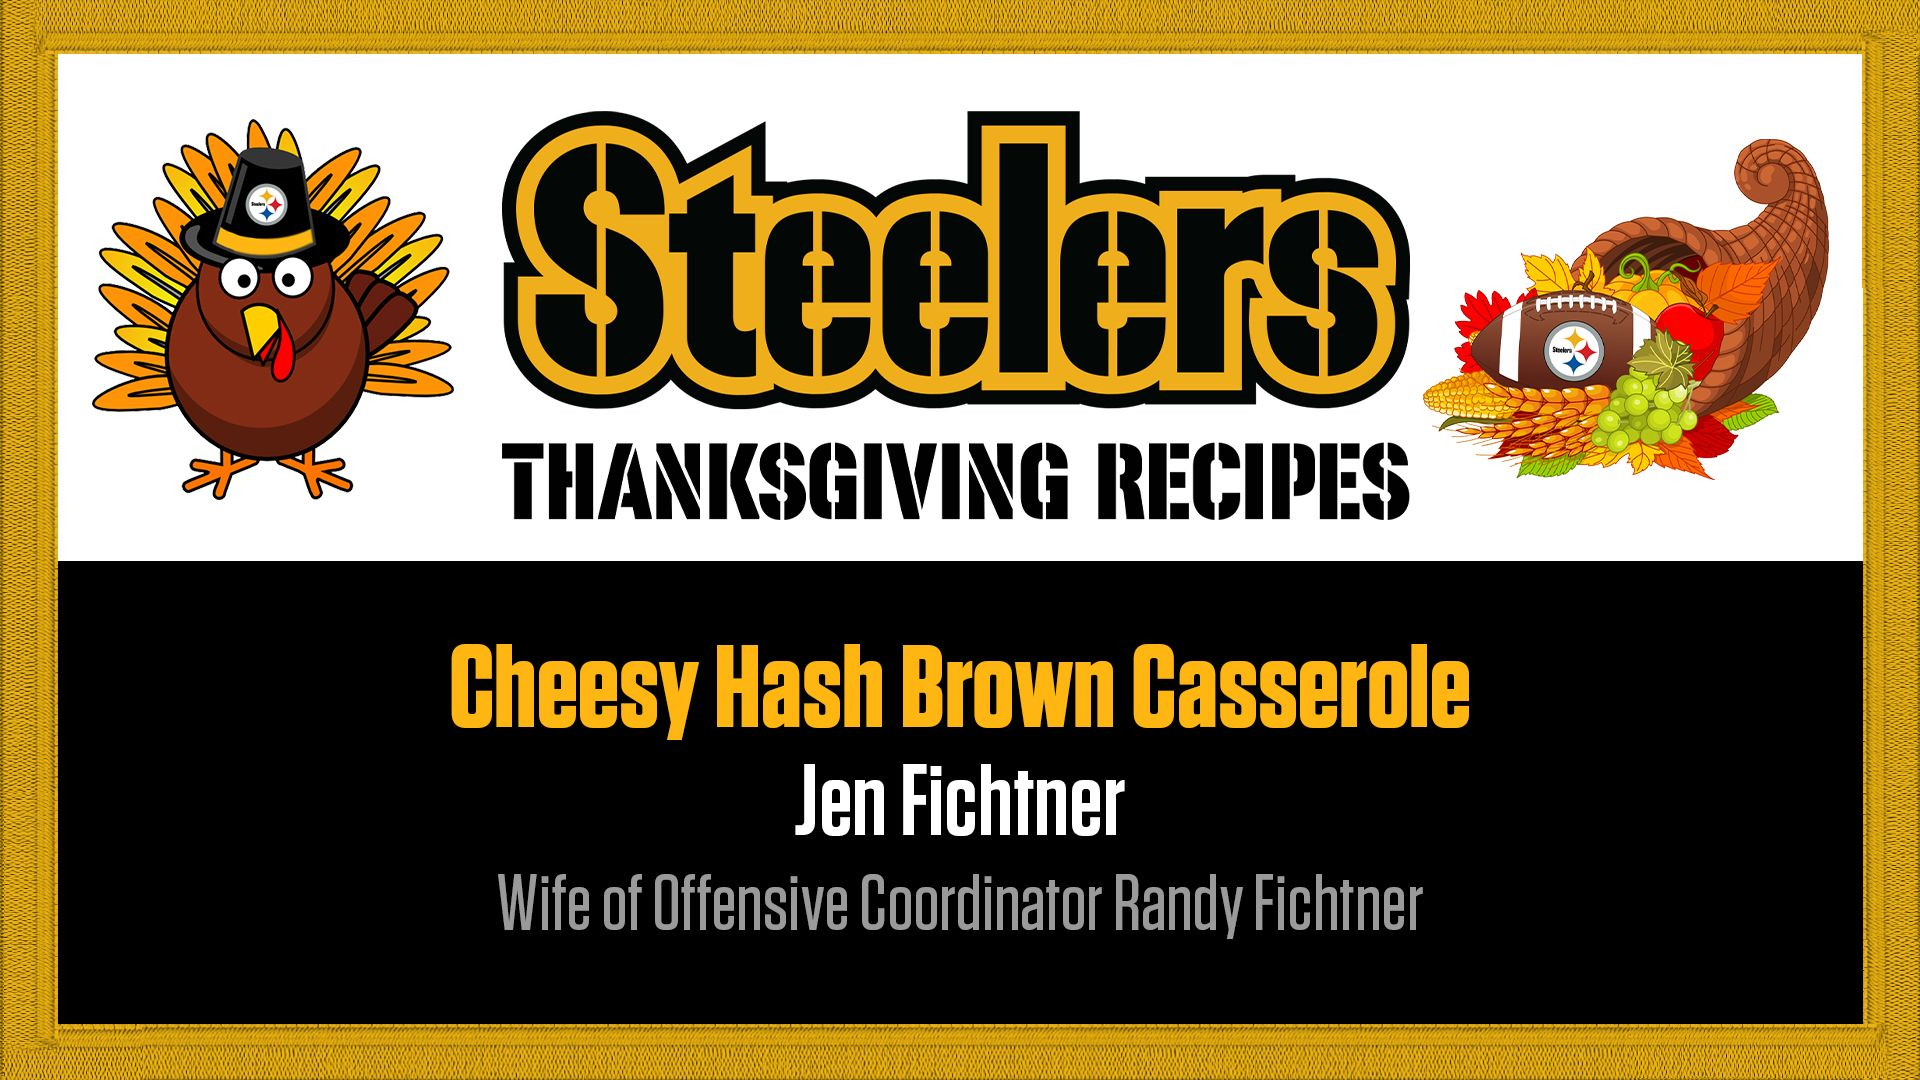 Recipe - cheesy hashbrown casserole_jen fichtner